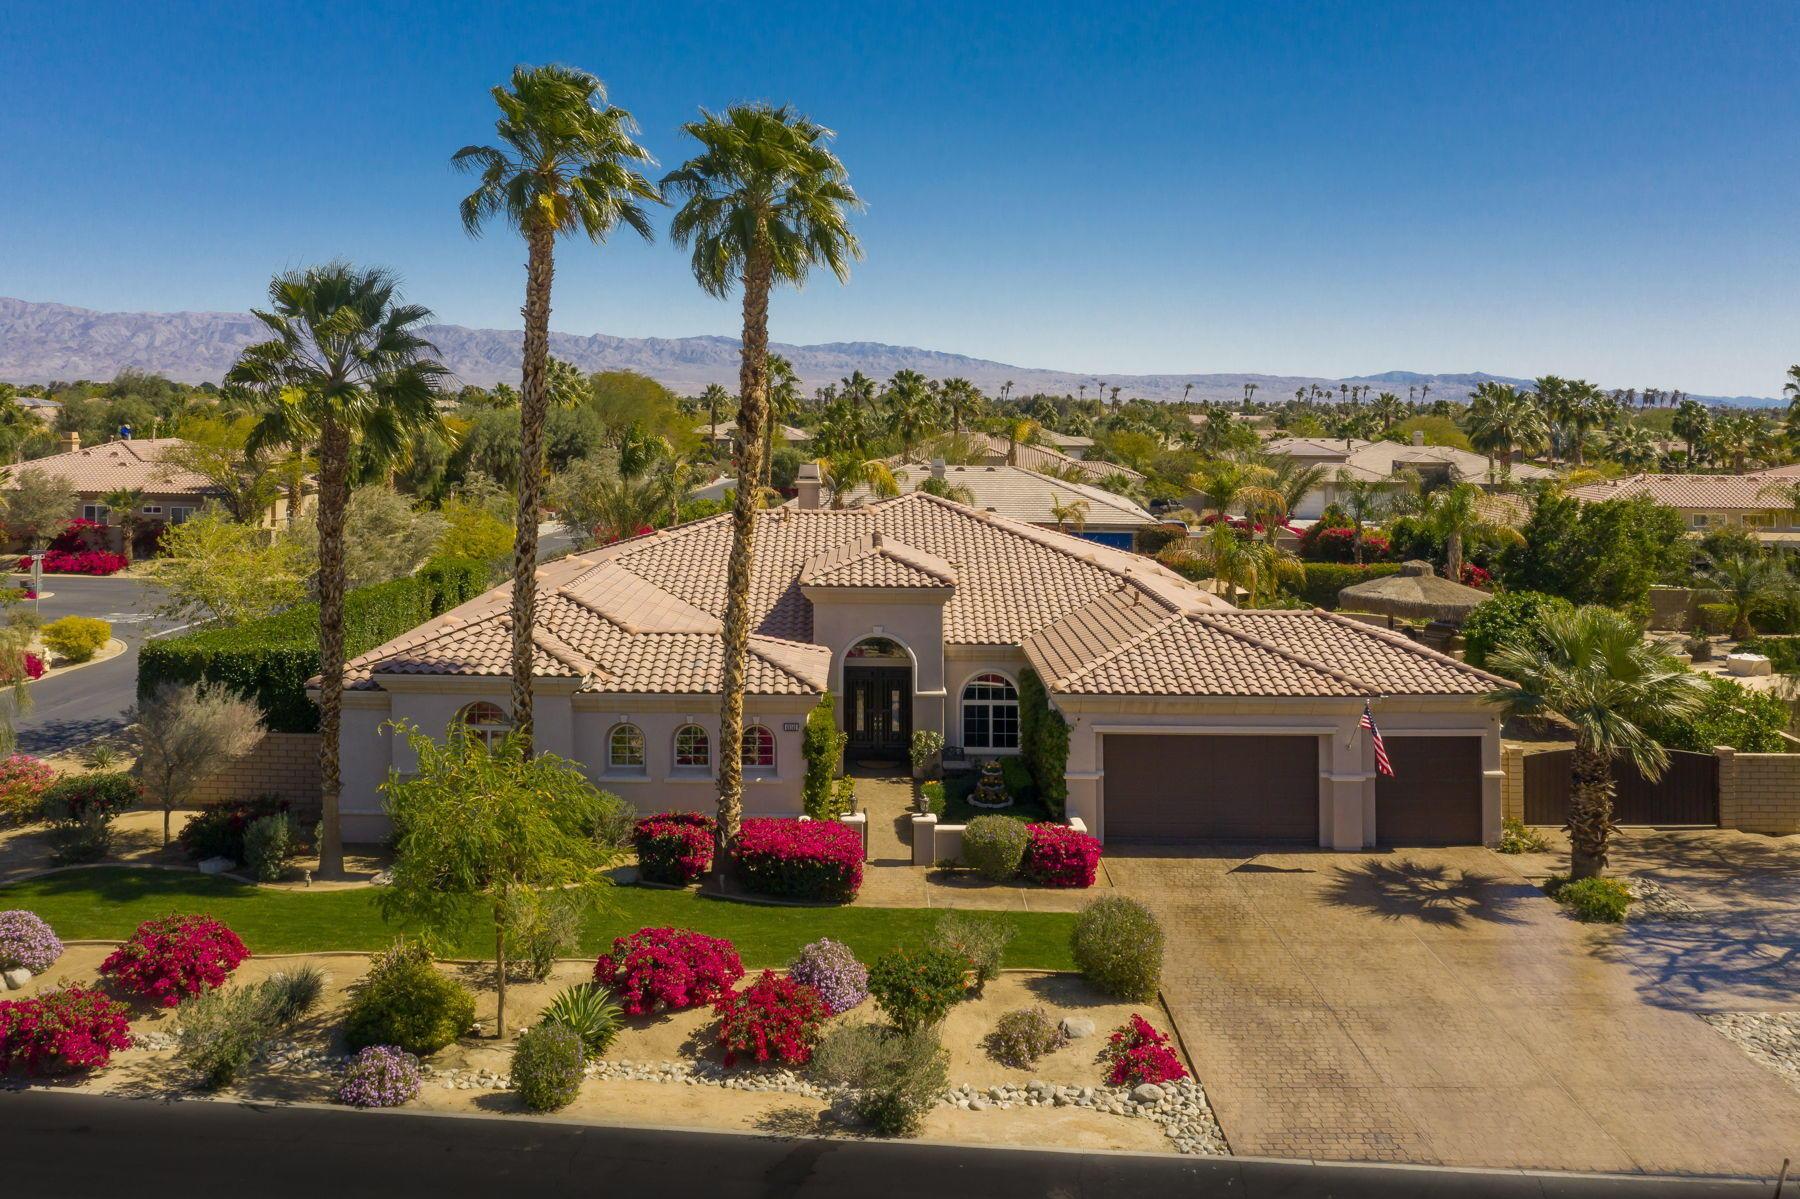 Photo of 49140 Jordan Street, Indio, CA 92201